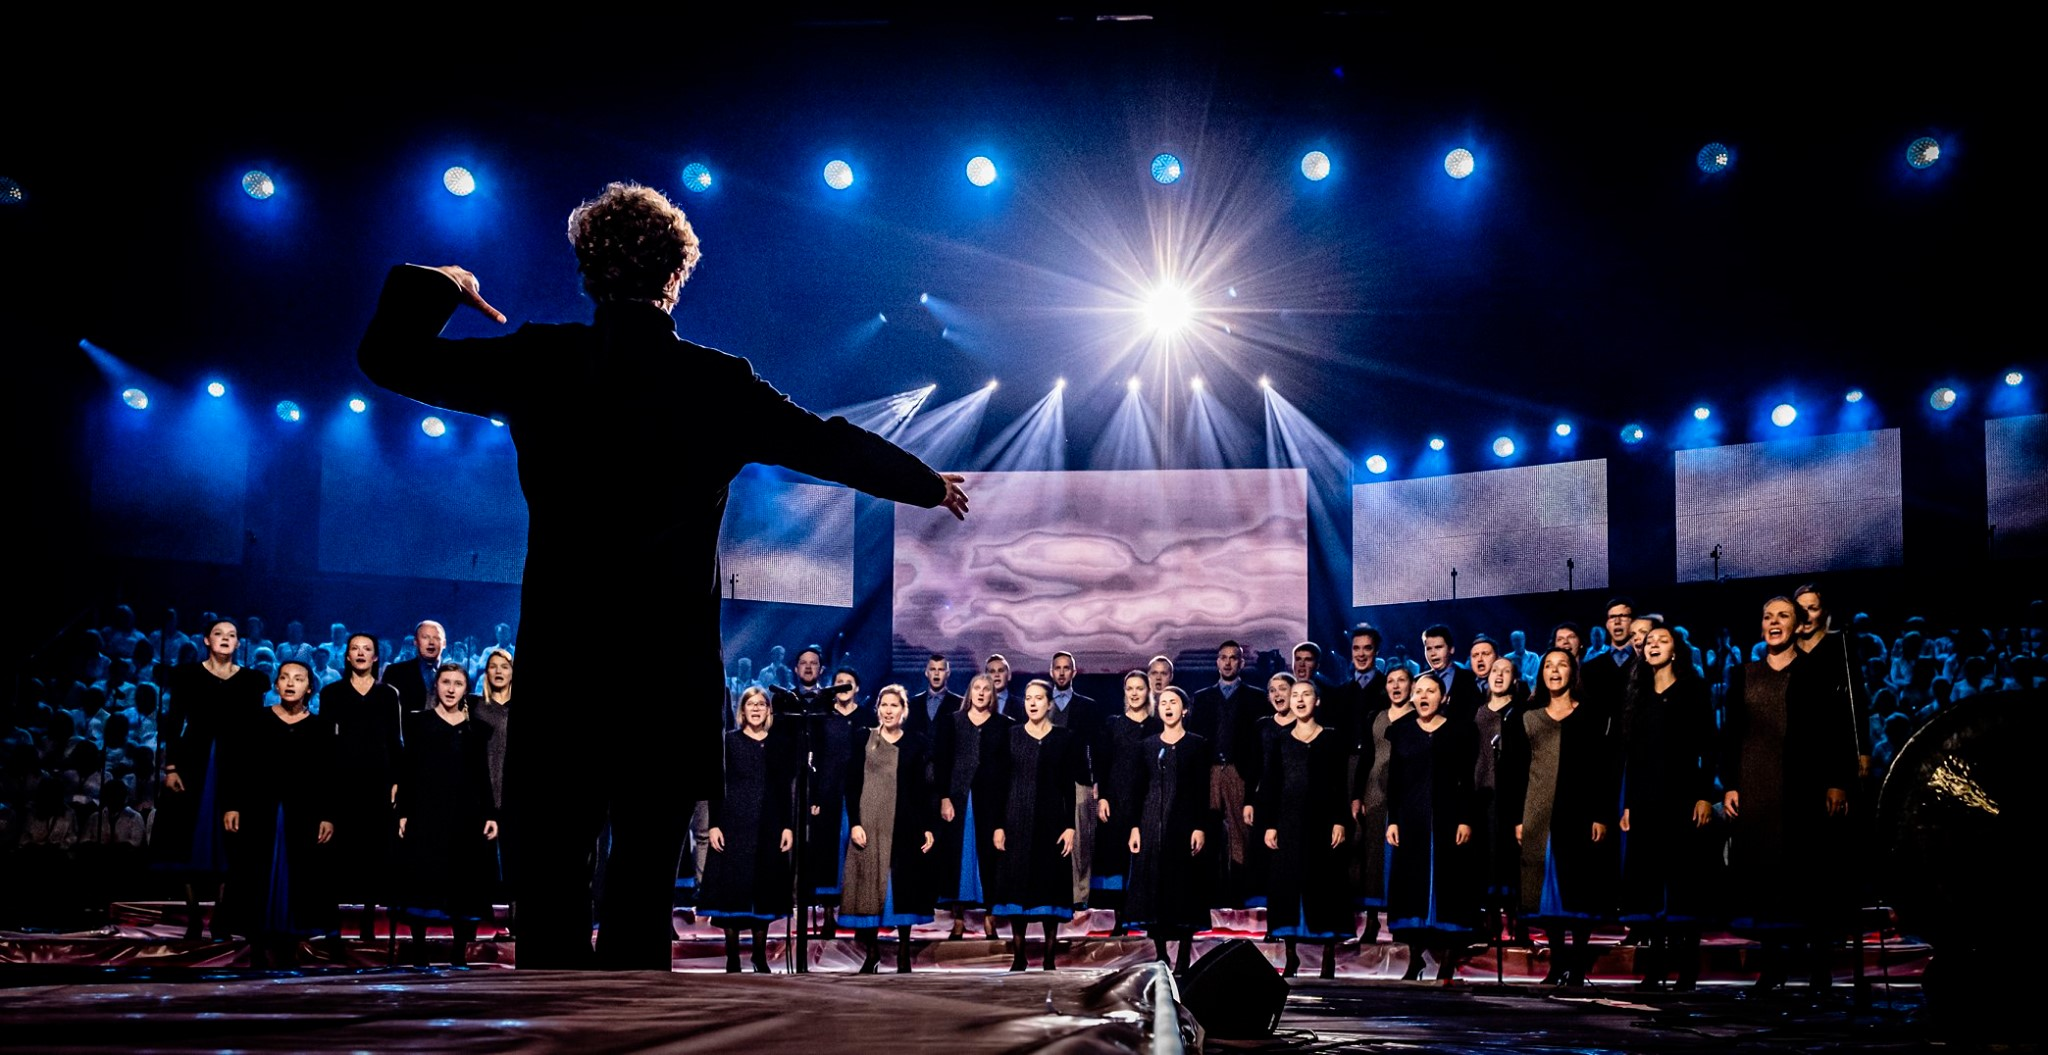 Latvia - Eurovision Choir 2019